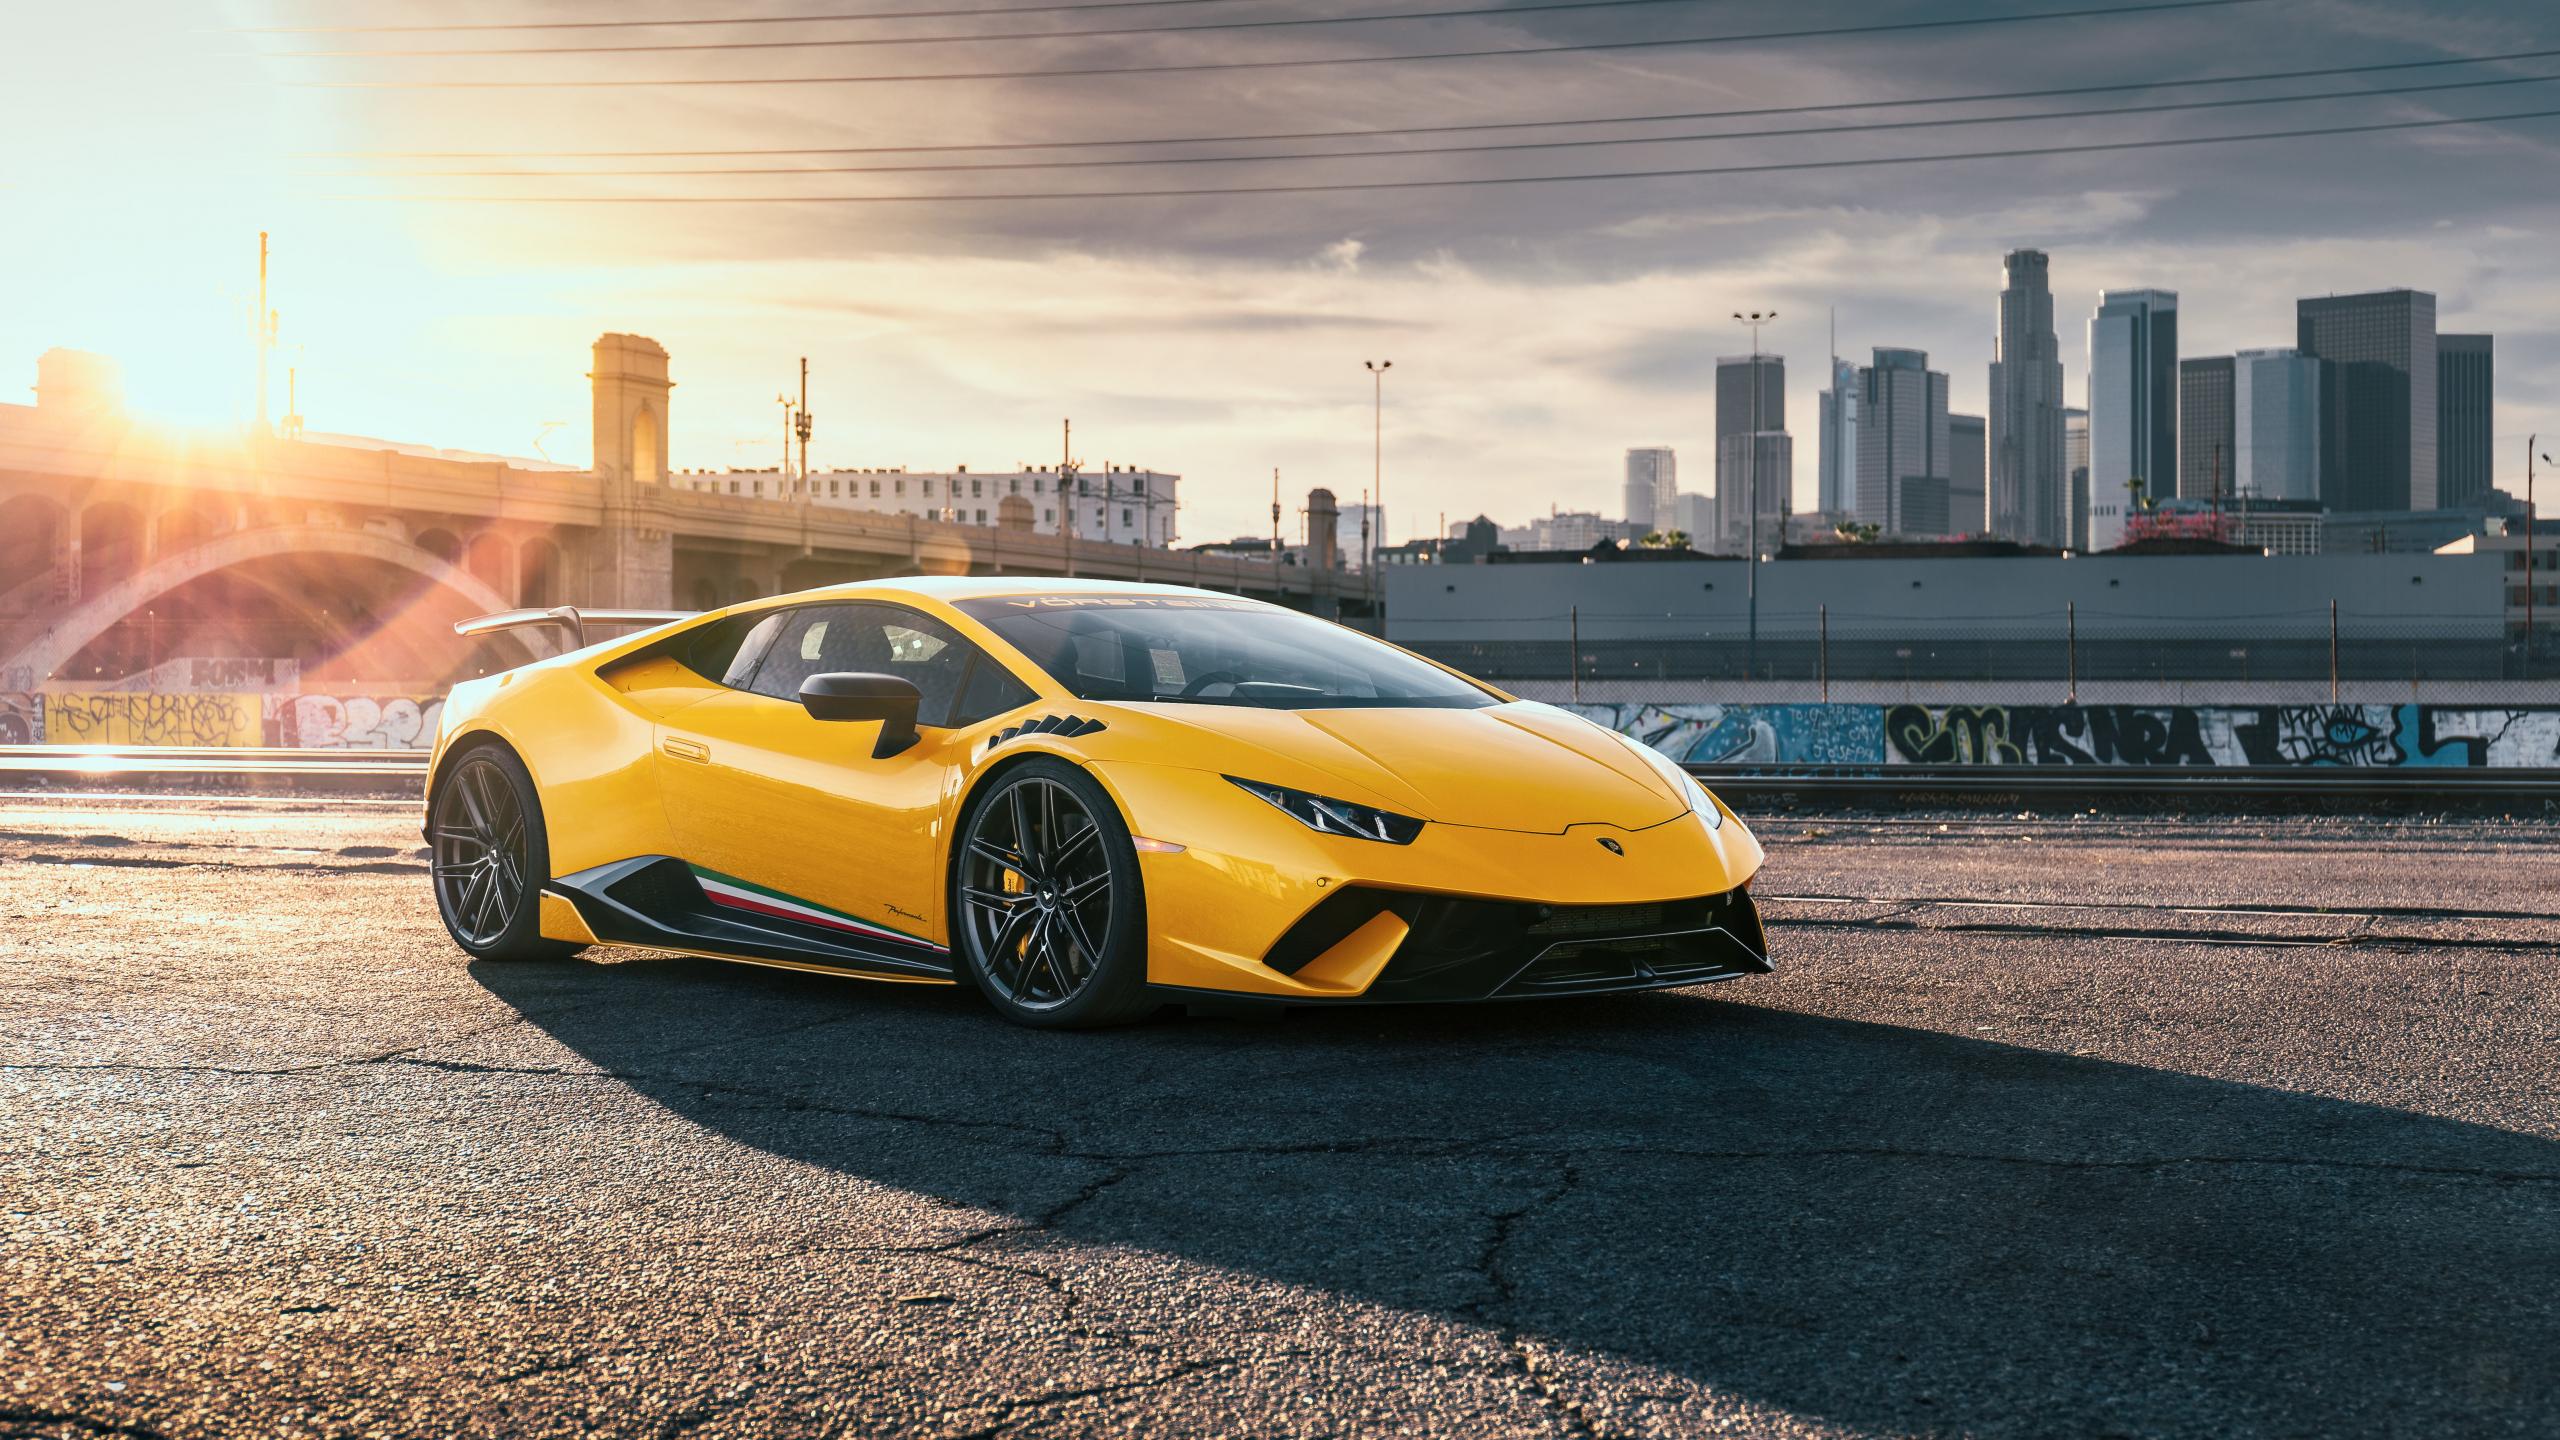 Wallpaper is no longer dated or stuffy. Download 2560x1440 Wallpaper Lamborghini Huracan Yellow Sports Car Dual Wide Widescreen 16 9 Widescreen 2560x1440 Hd Image Background 21628